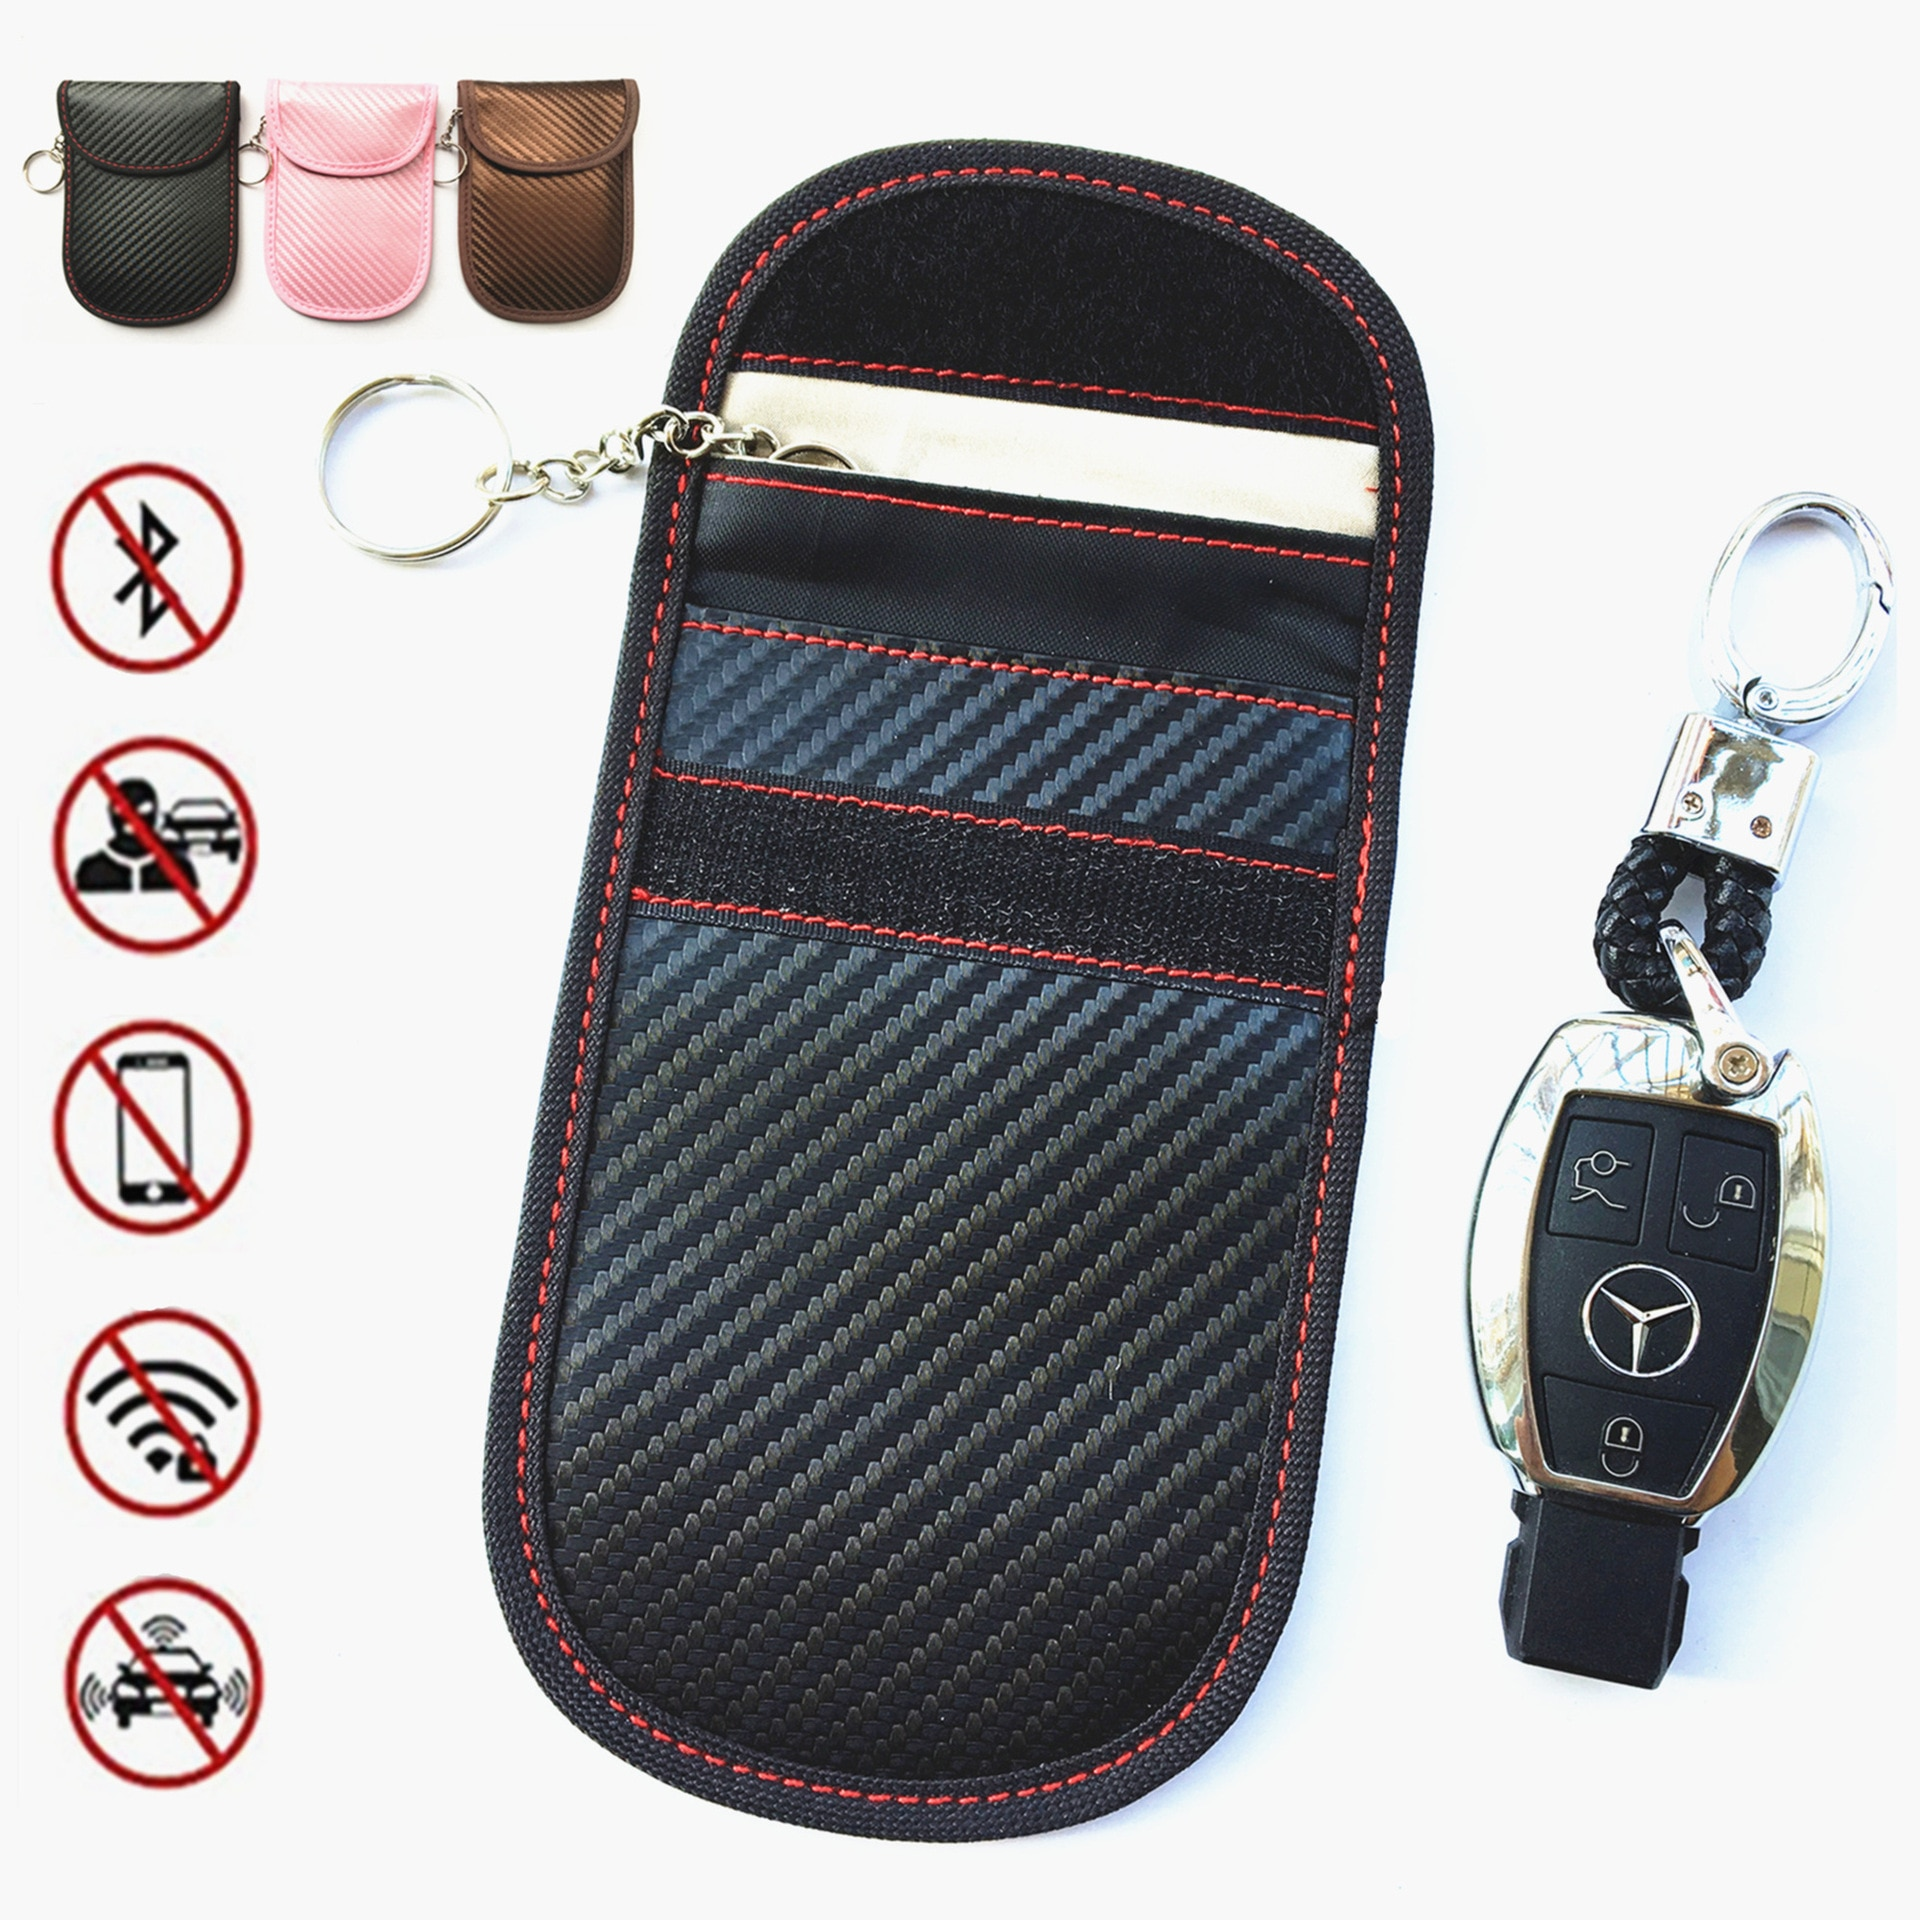 Atualizado saco para chave de carro fob protetor de chave rfid sinal bloqueio anti-roubo bolsa anti-hacking caso bloqueador de fibra de carbono